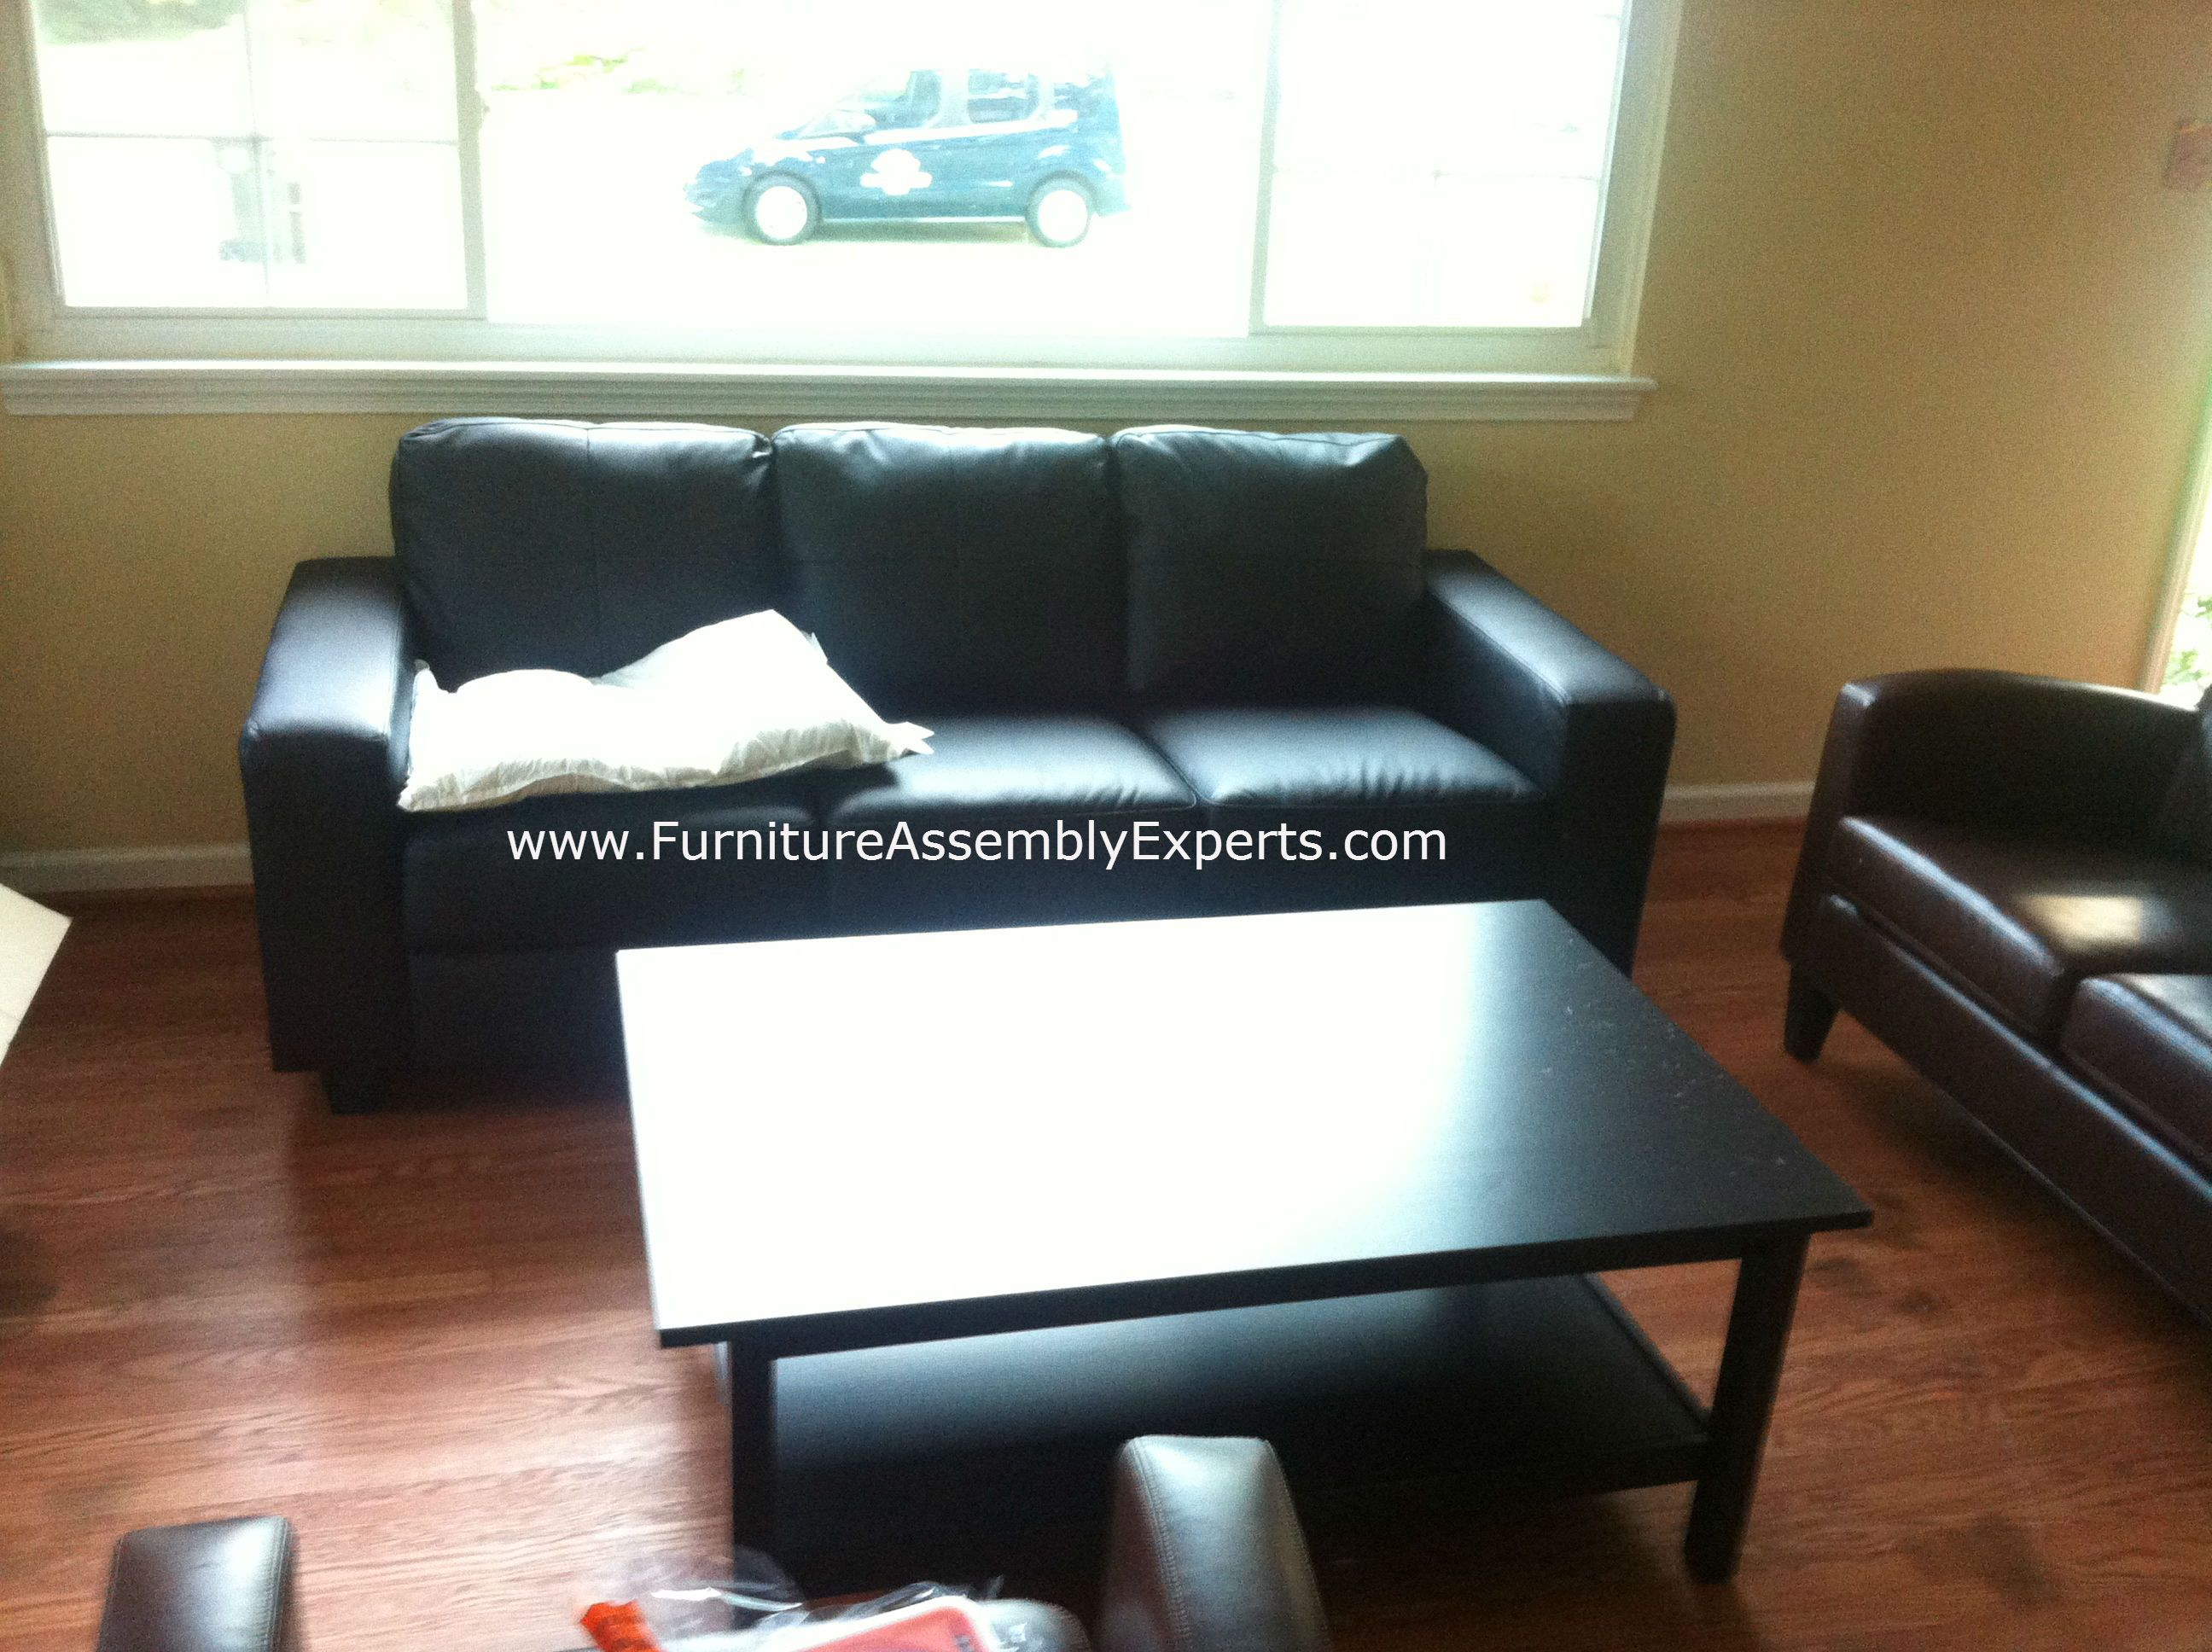 leather sofa washington dc interiors studio city ikea skogaby and lack coffee table assembled